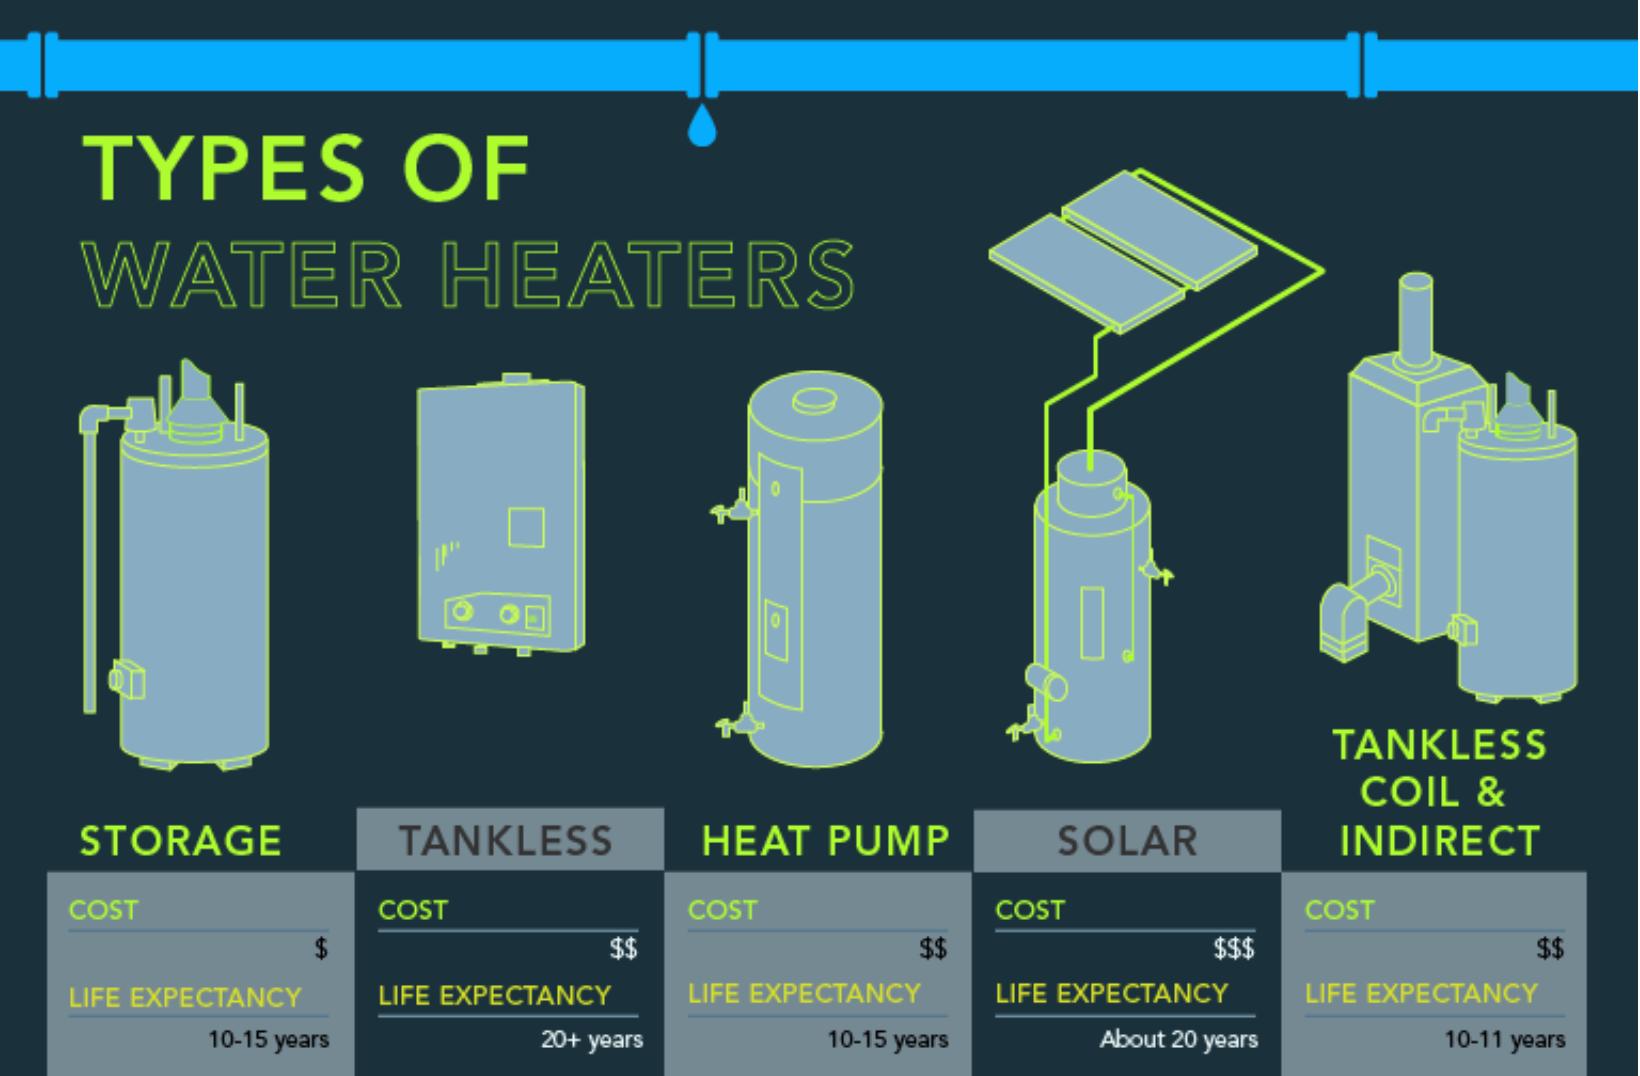 understanding the types of water heaters